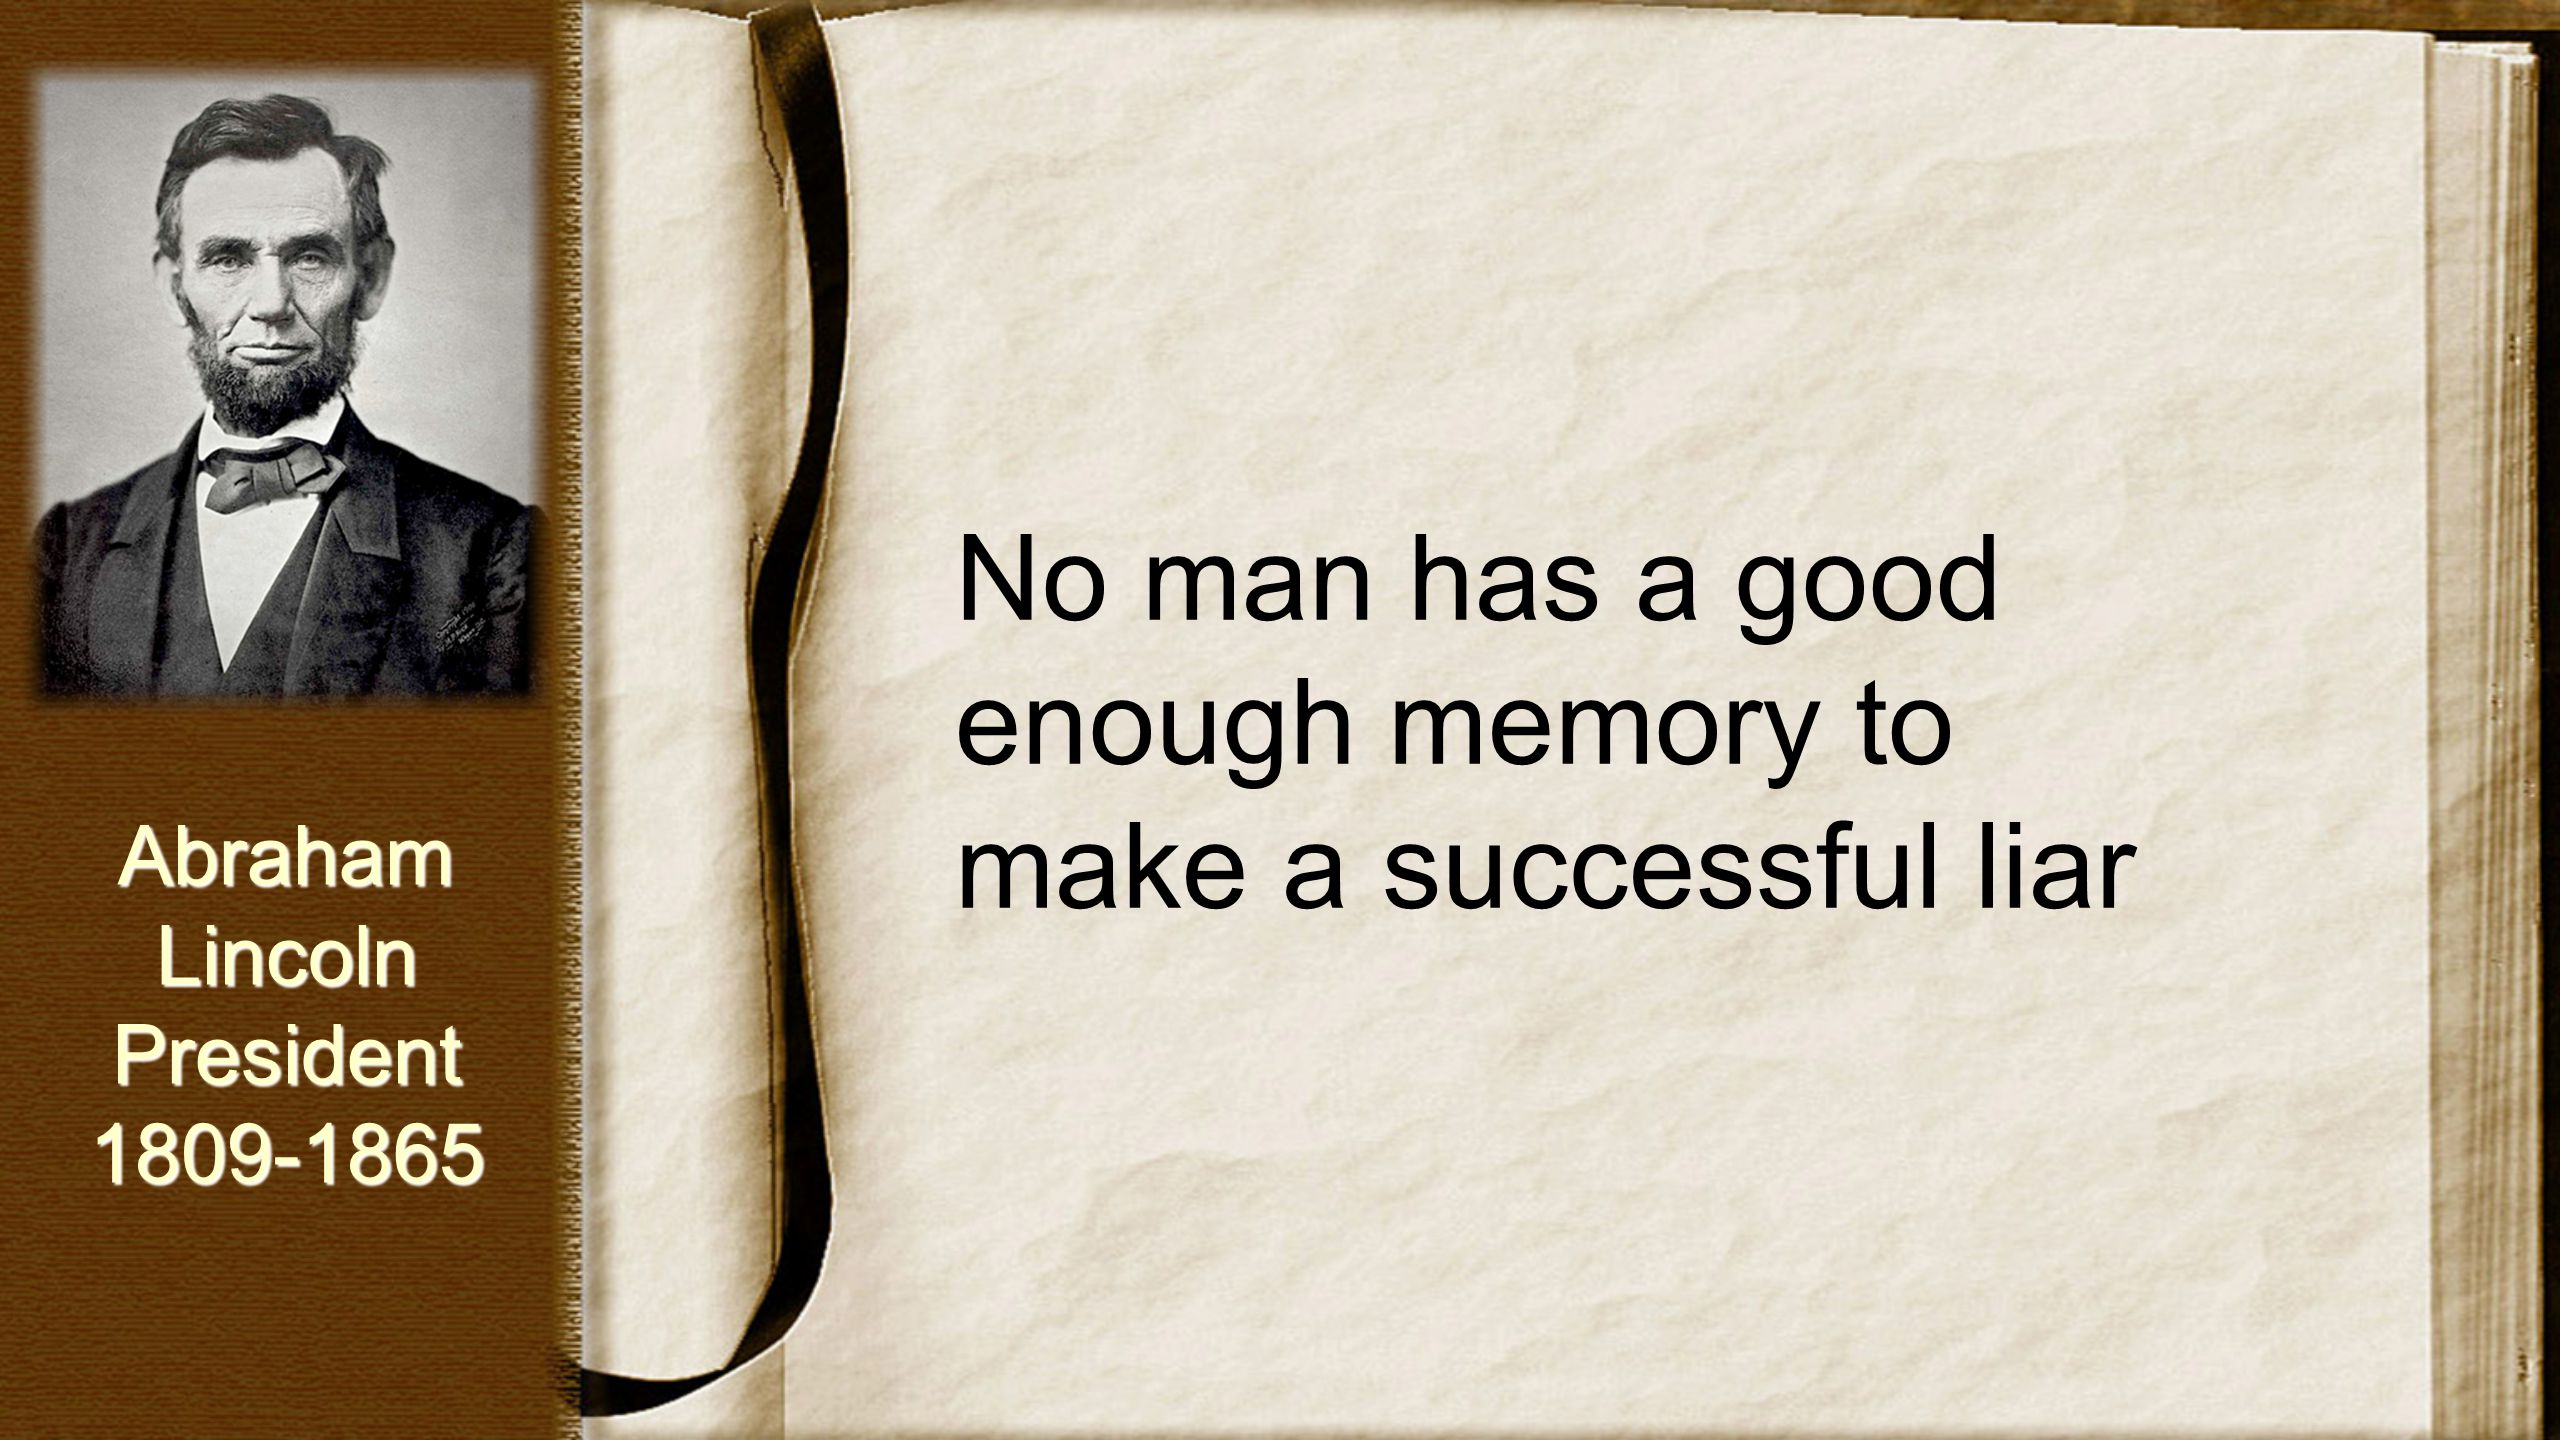 No man has a good enough memory to make a successful liar AbrahamLincolnPresident1809-1865